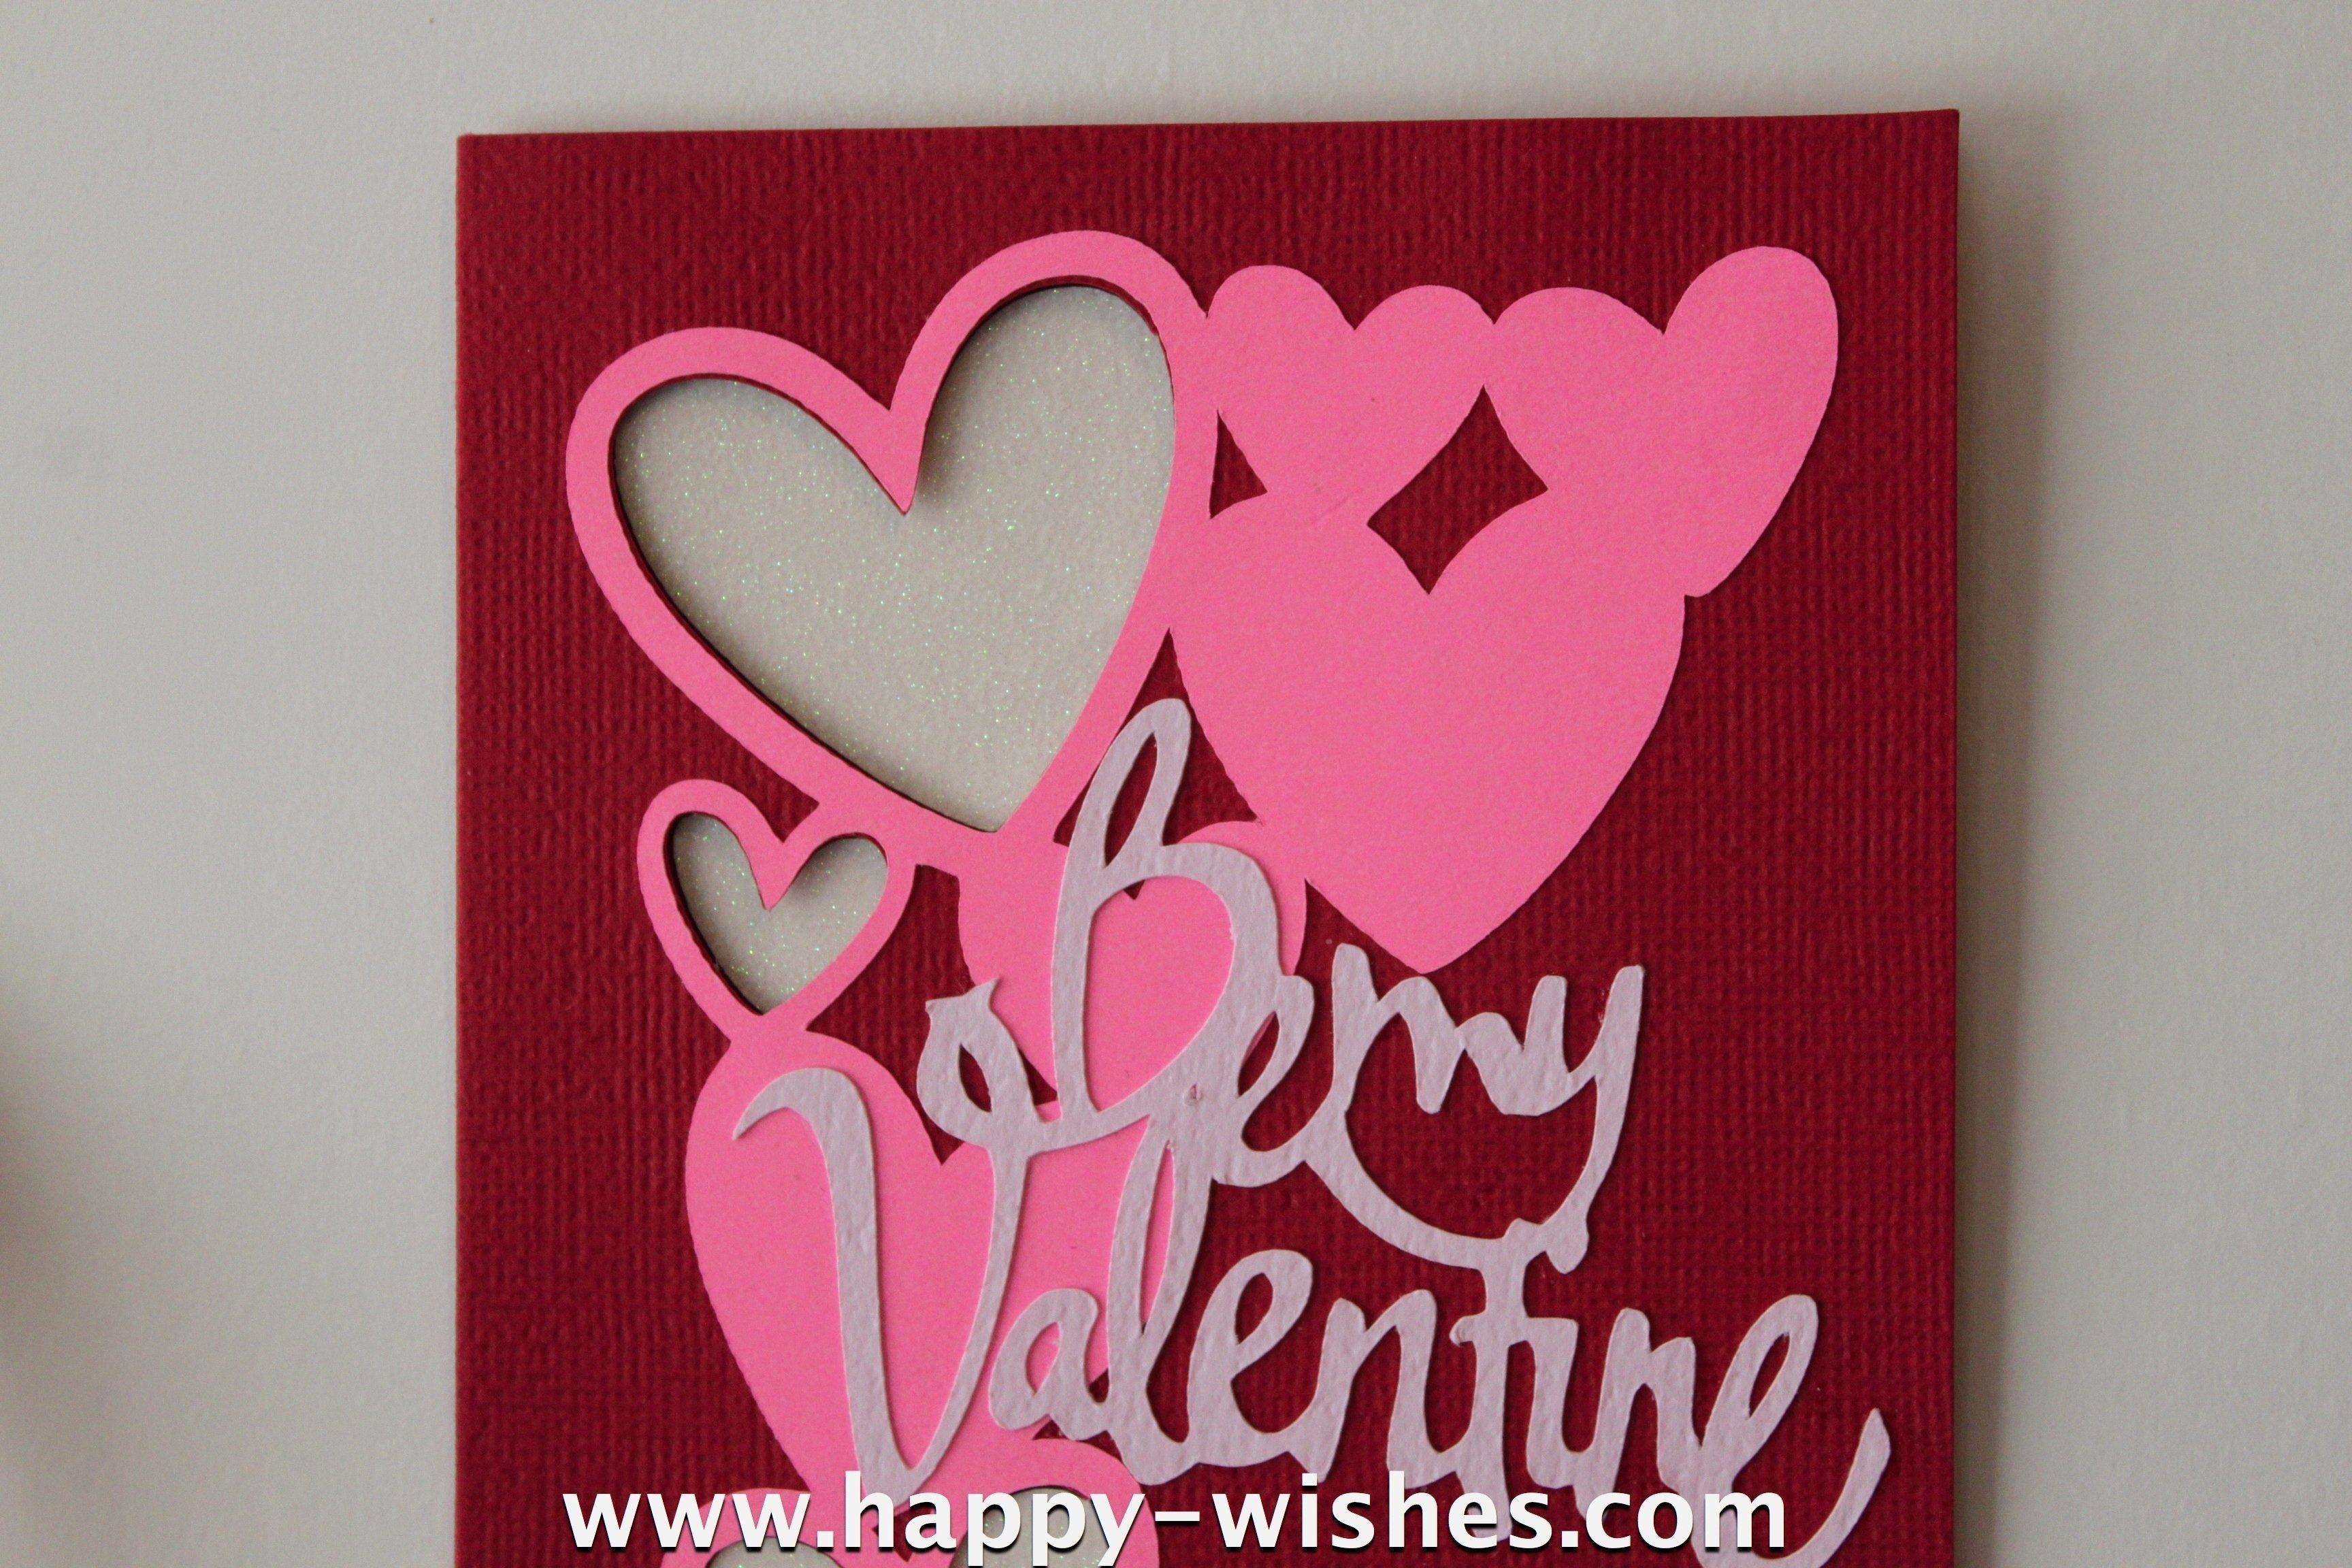 10 Stunning Valentine Card Ideas For Him creative diy card diy day card ideas tutorials crafts booming to 1 2020